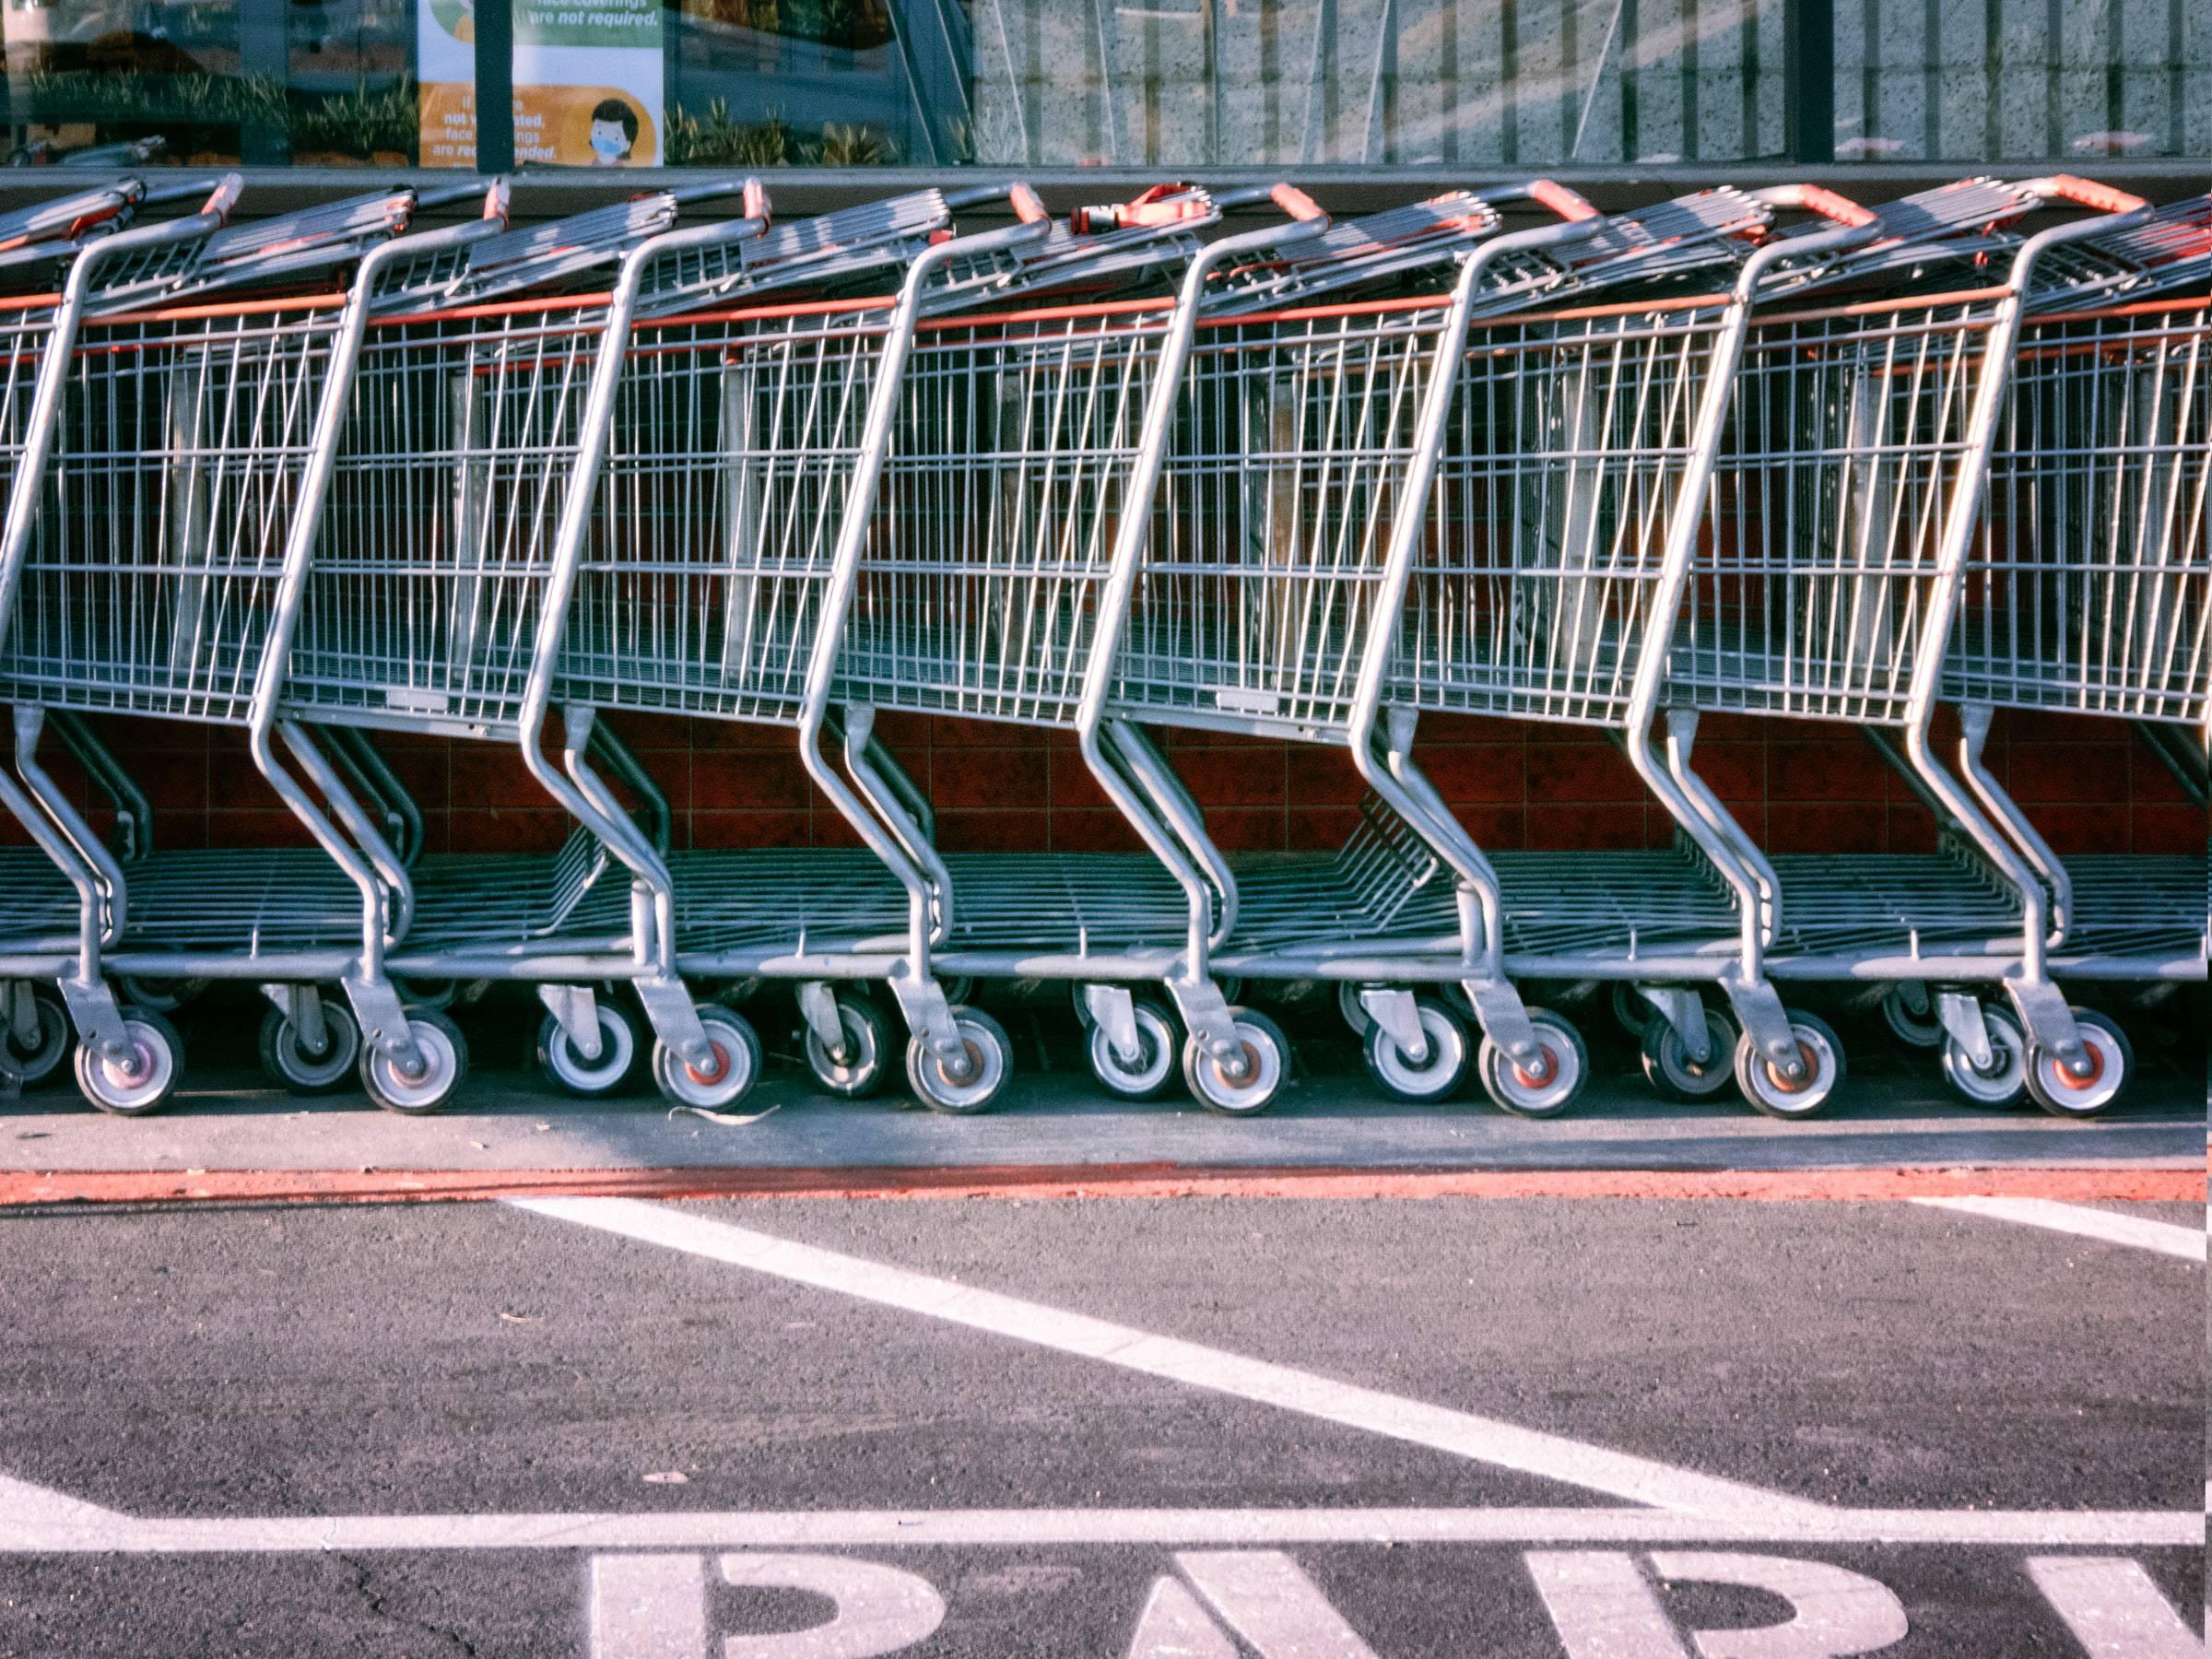 online store business plan sample